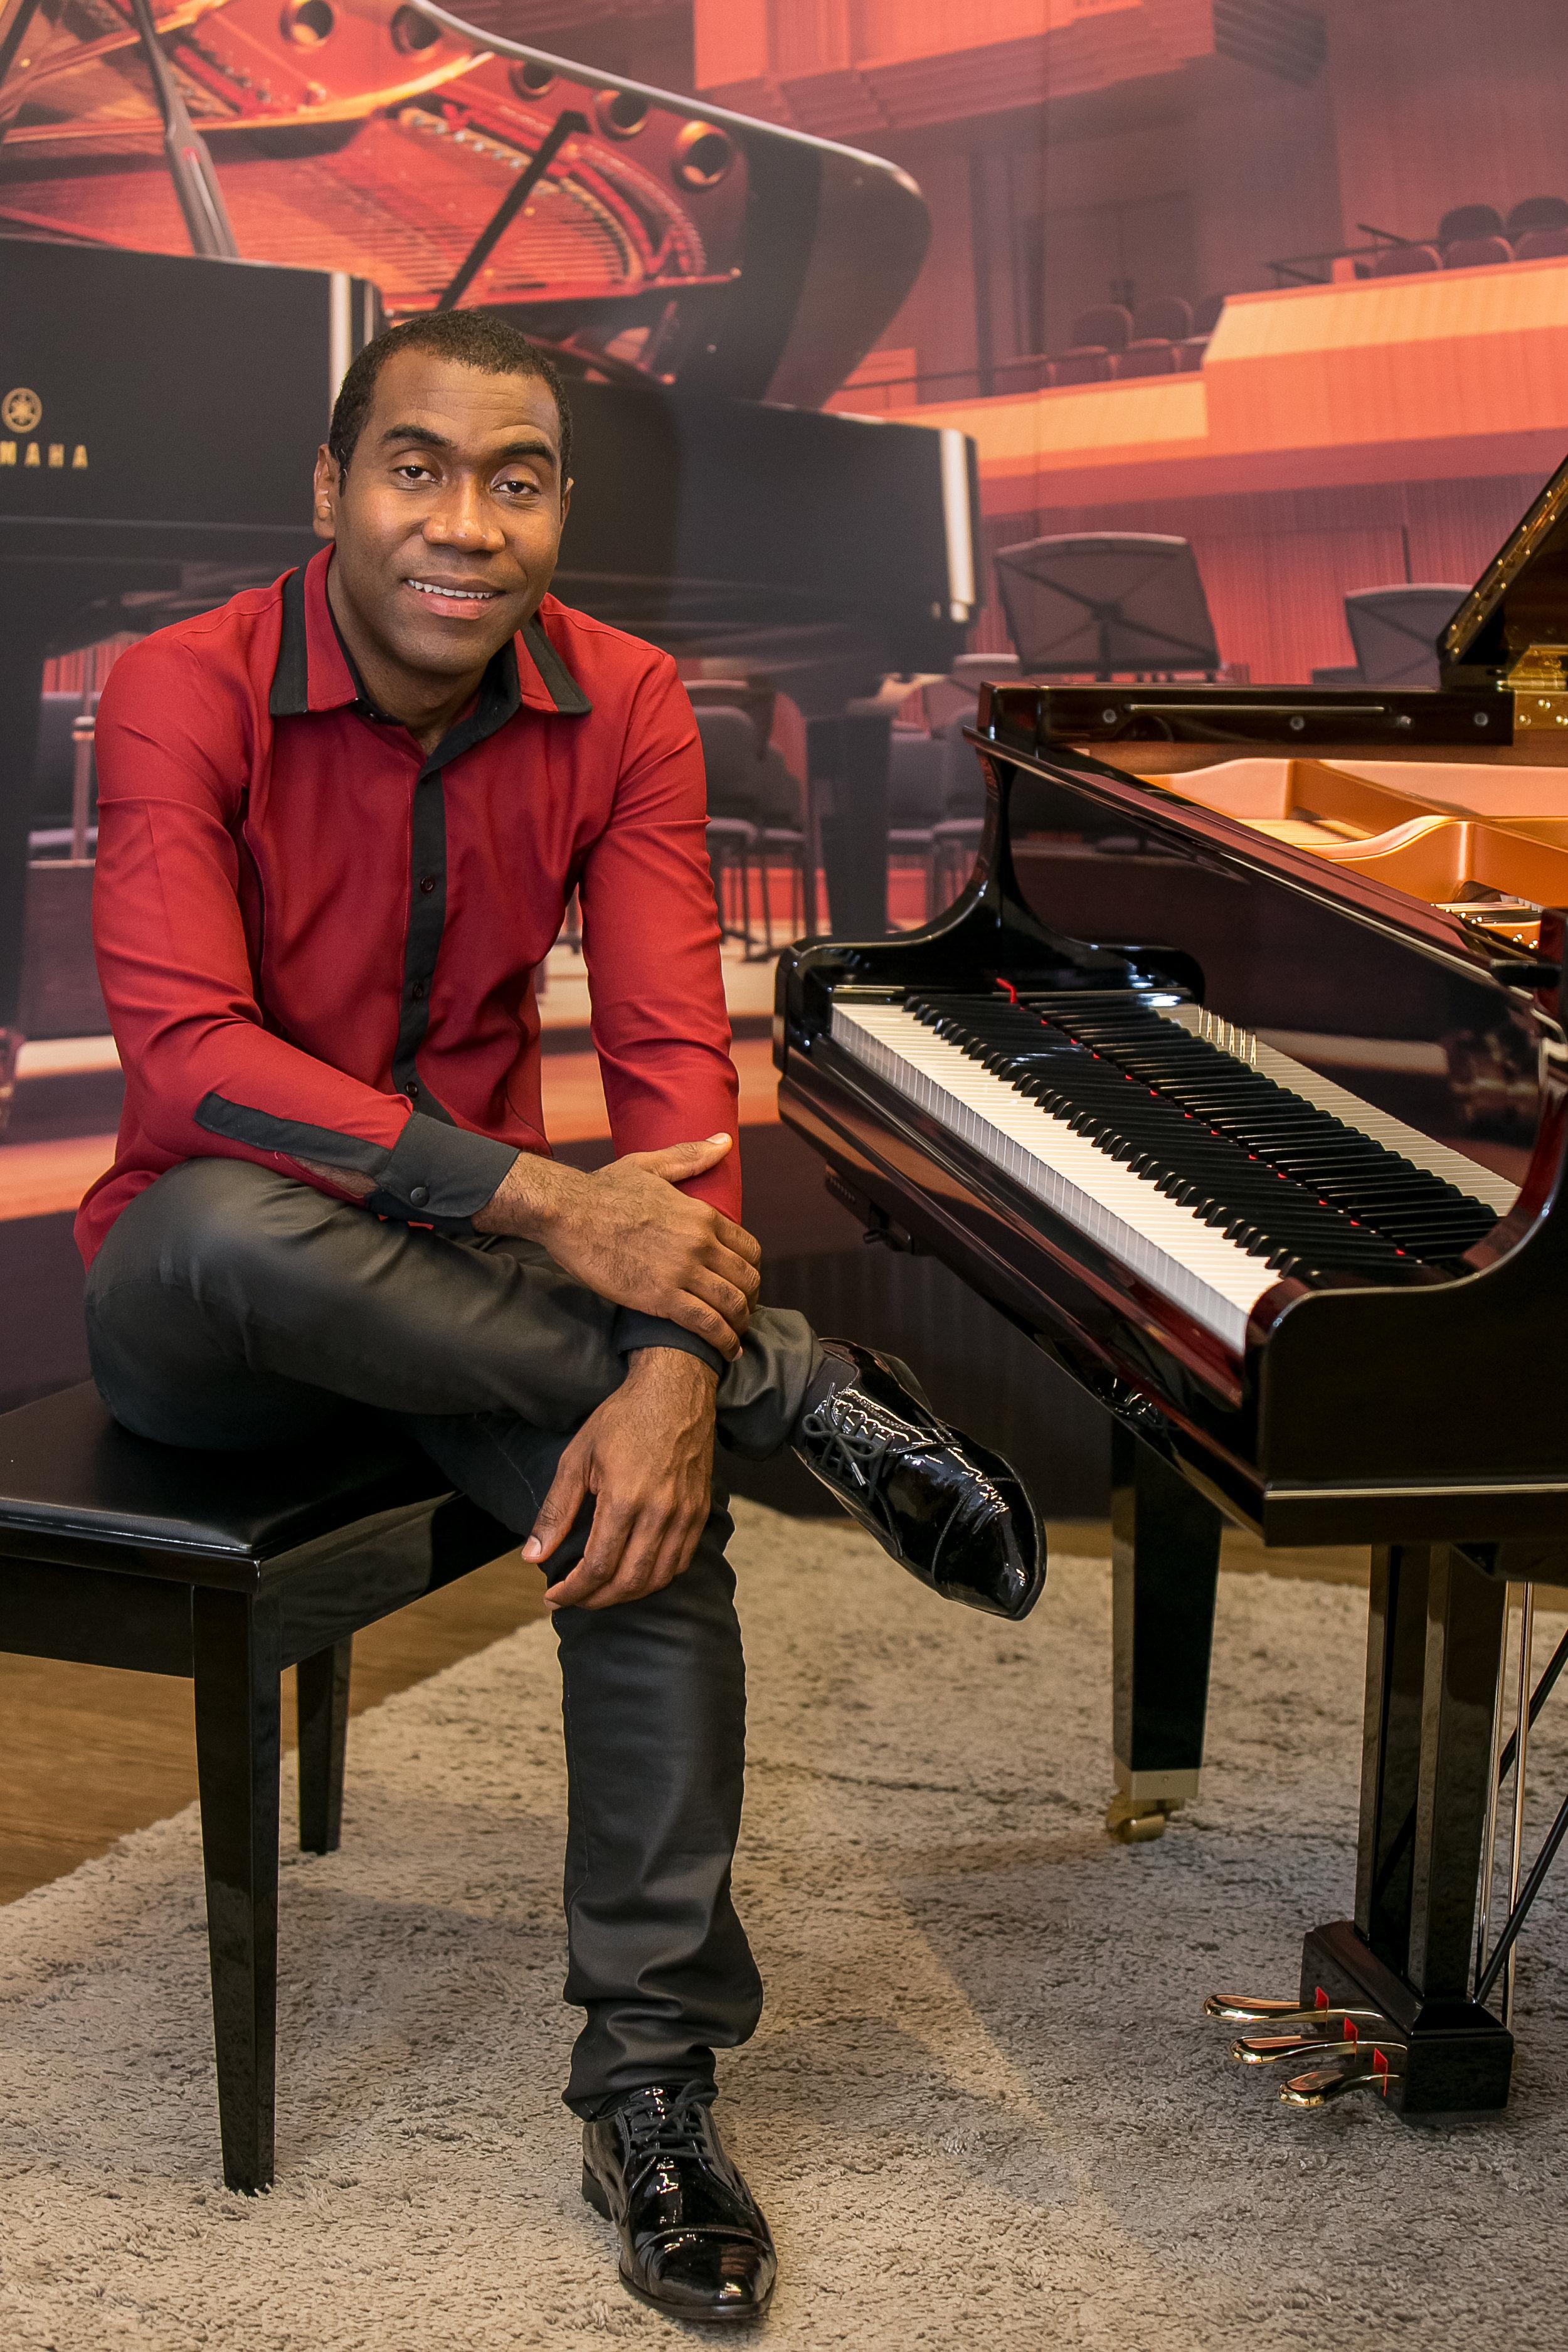 Hercules Gomes